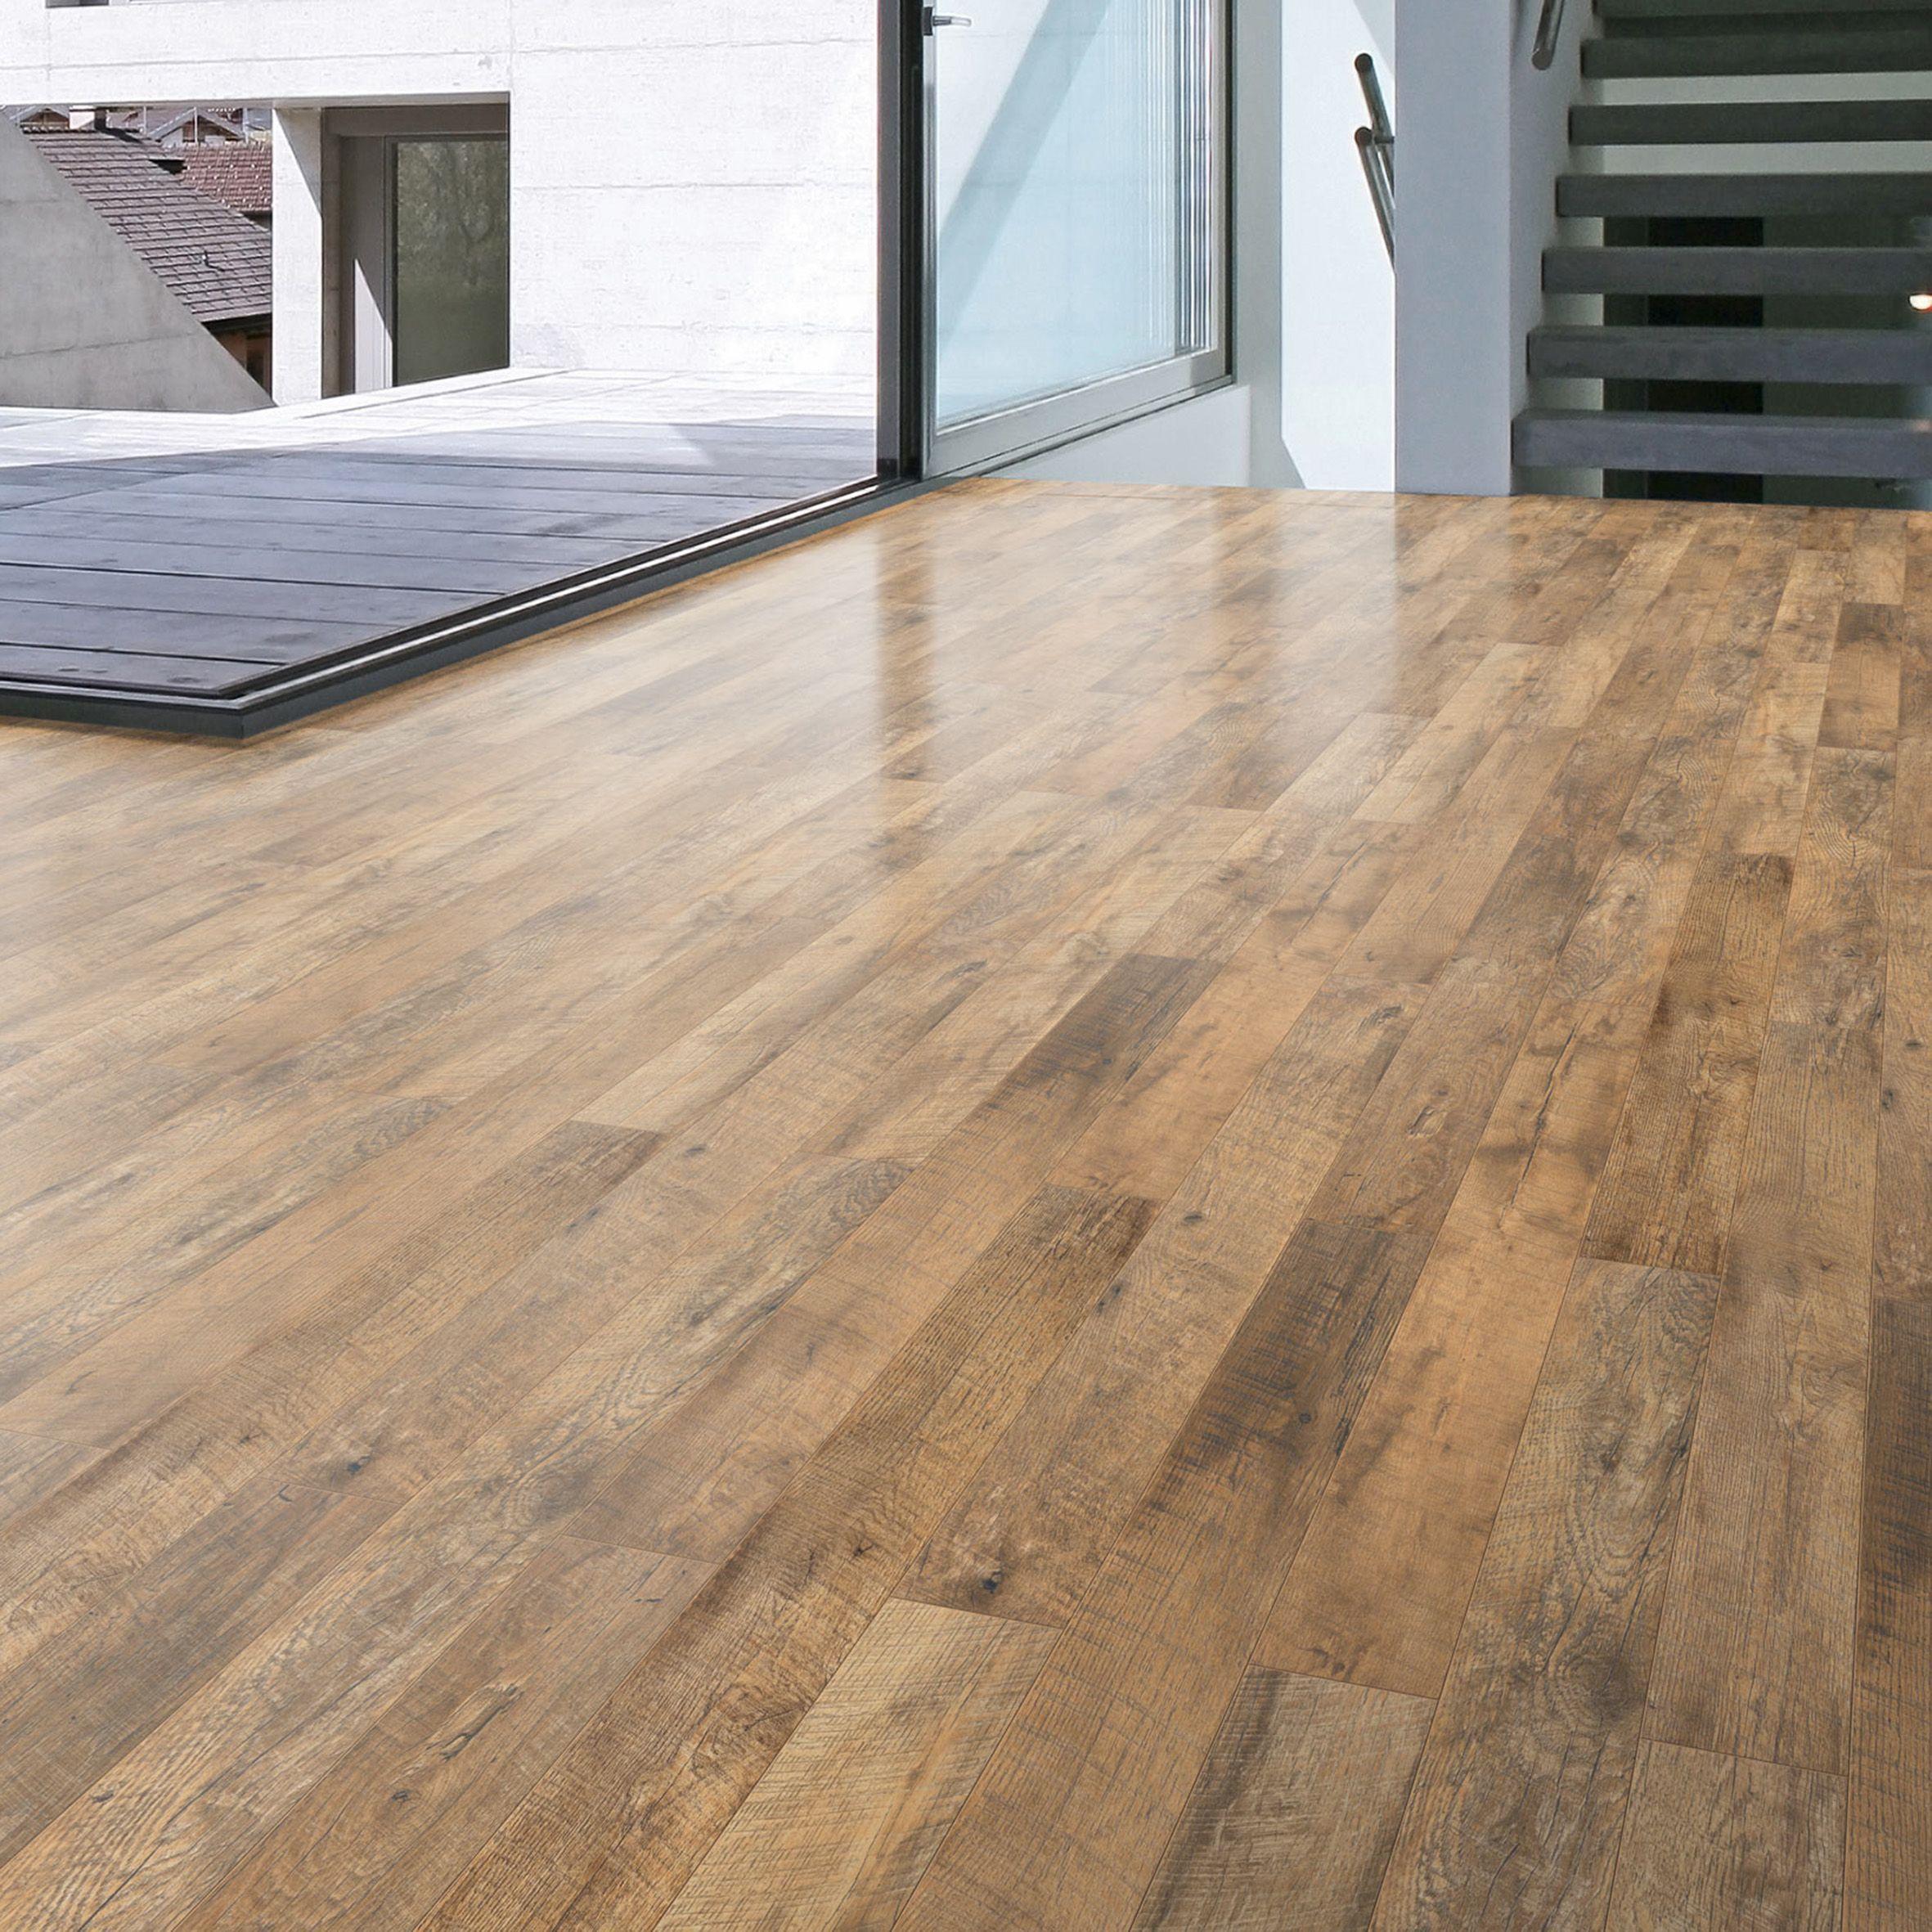 Floating Floor Colours: Colours Guarcino Reclaimed Oak Effect Laminate Flooring, 1